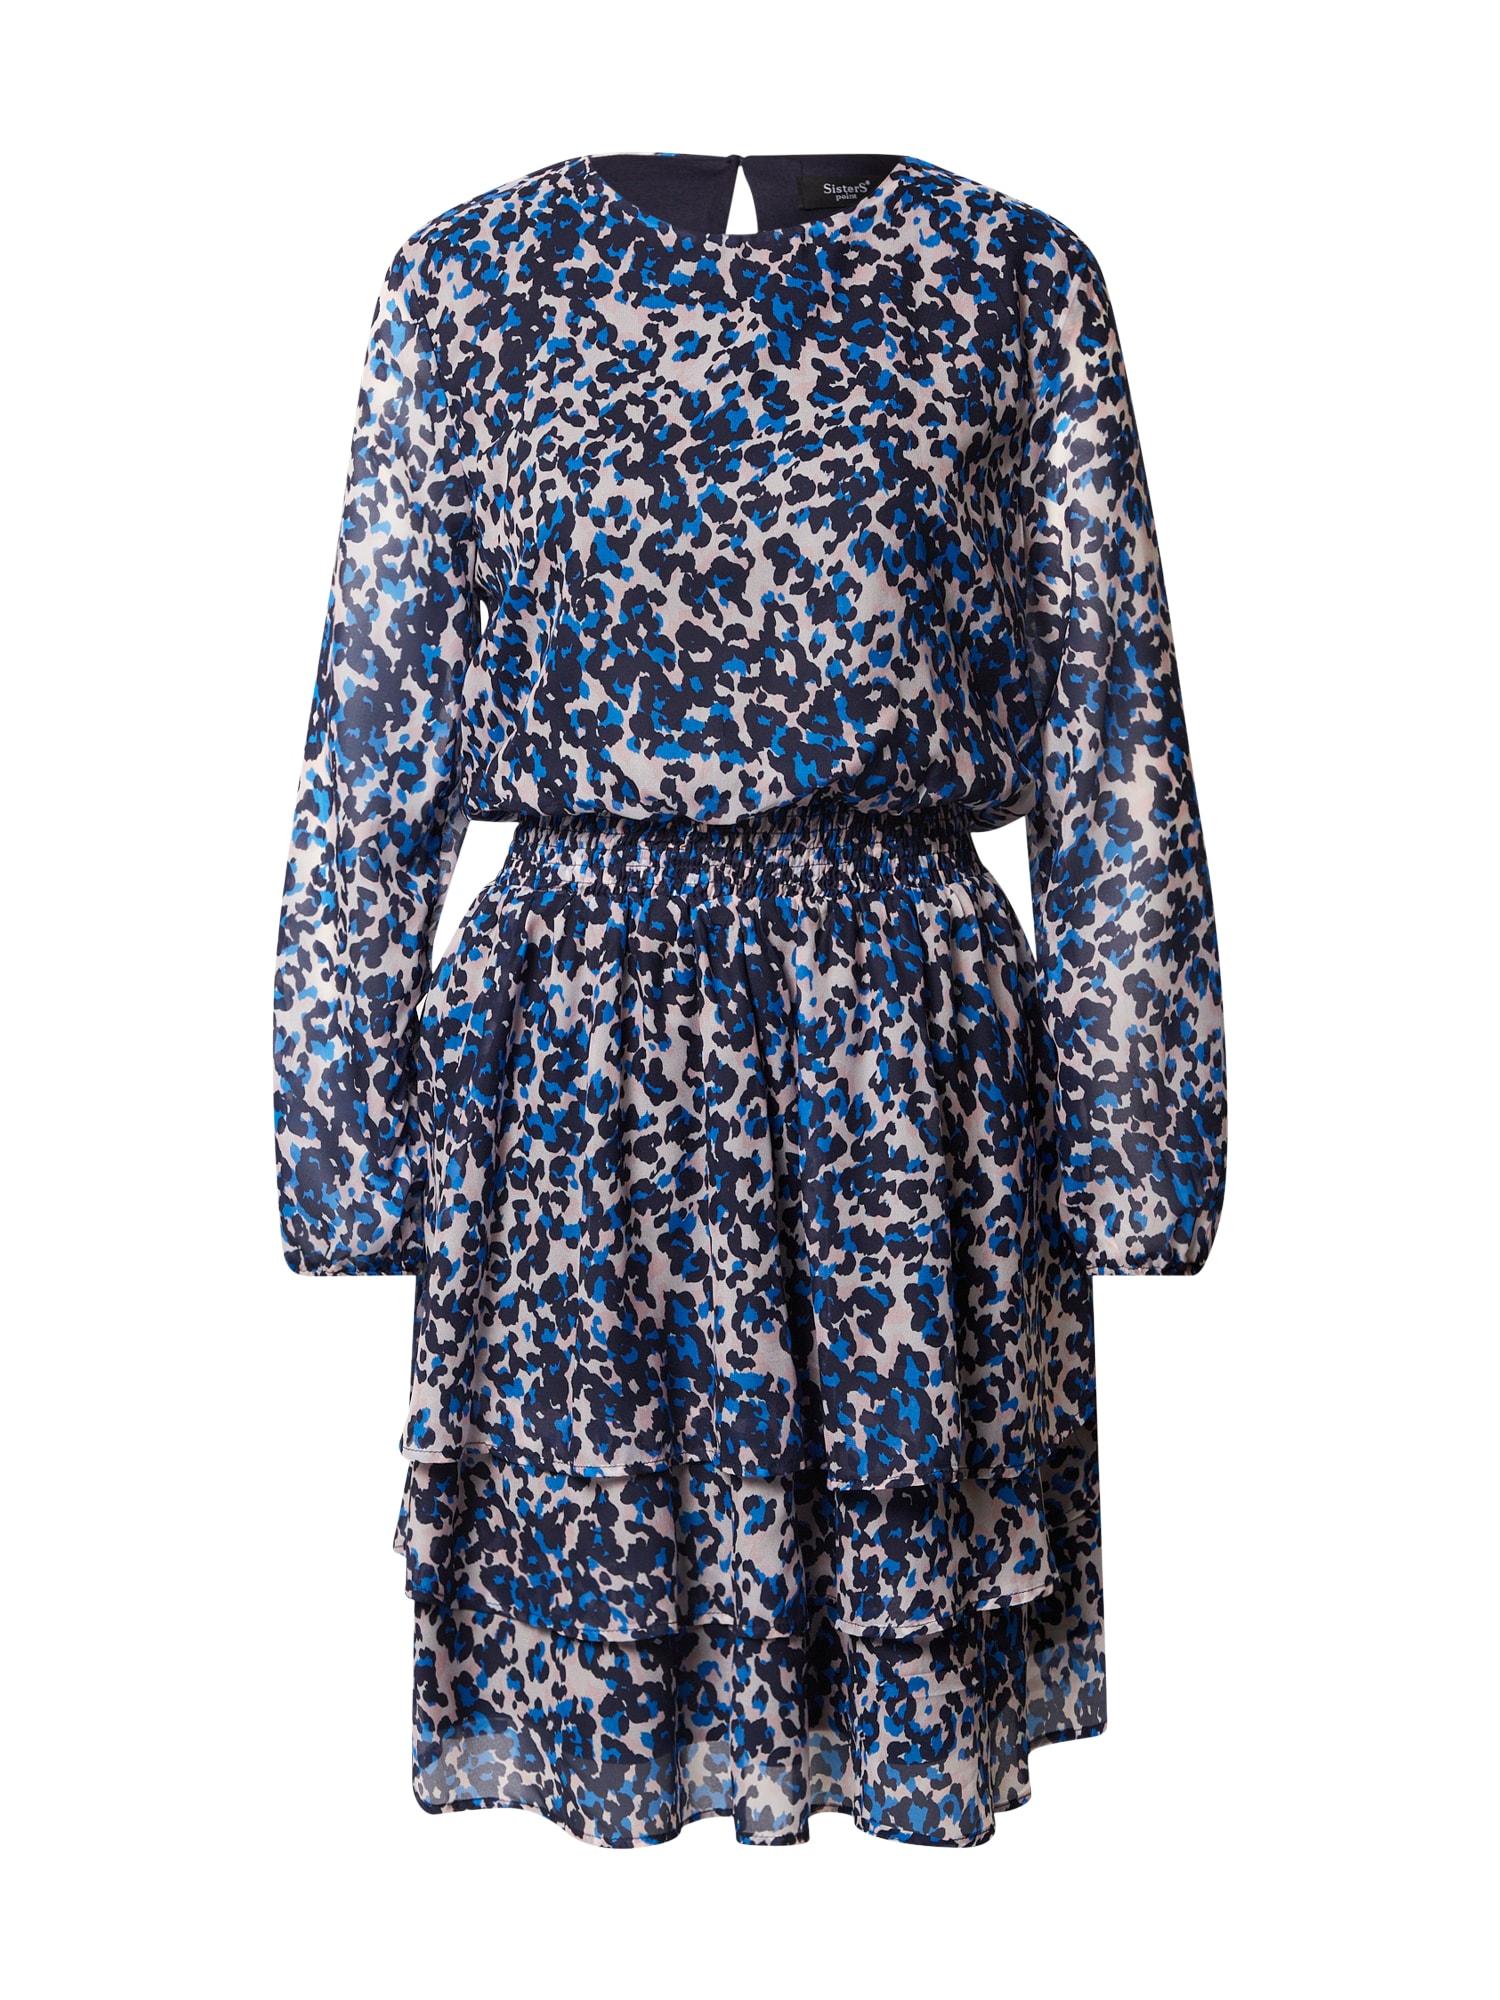 SISTERS POINT Šaty 'Nicoline'  modrá / krémová